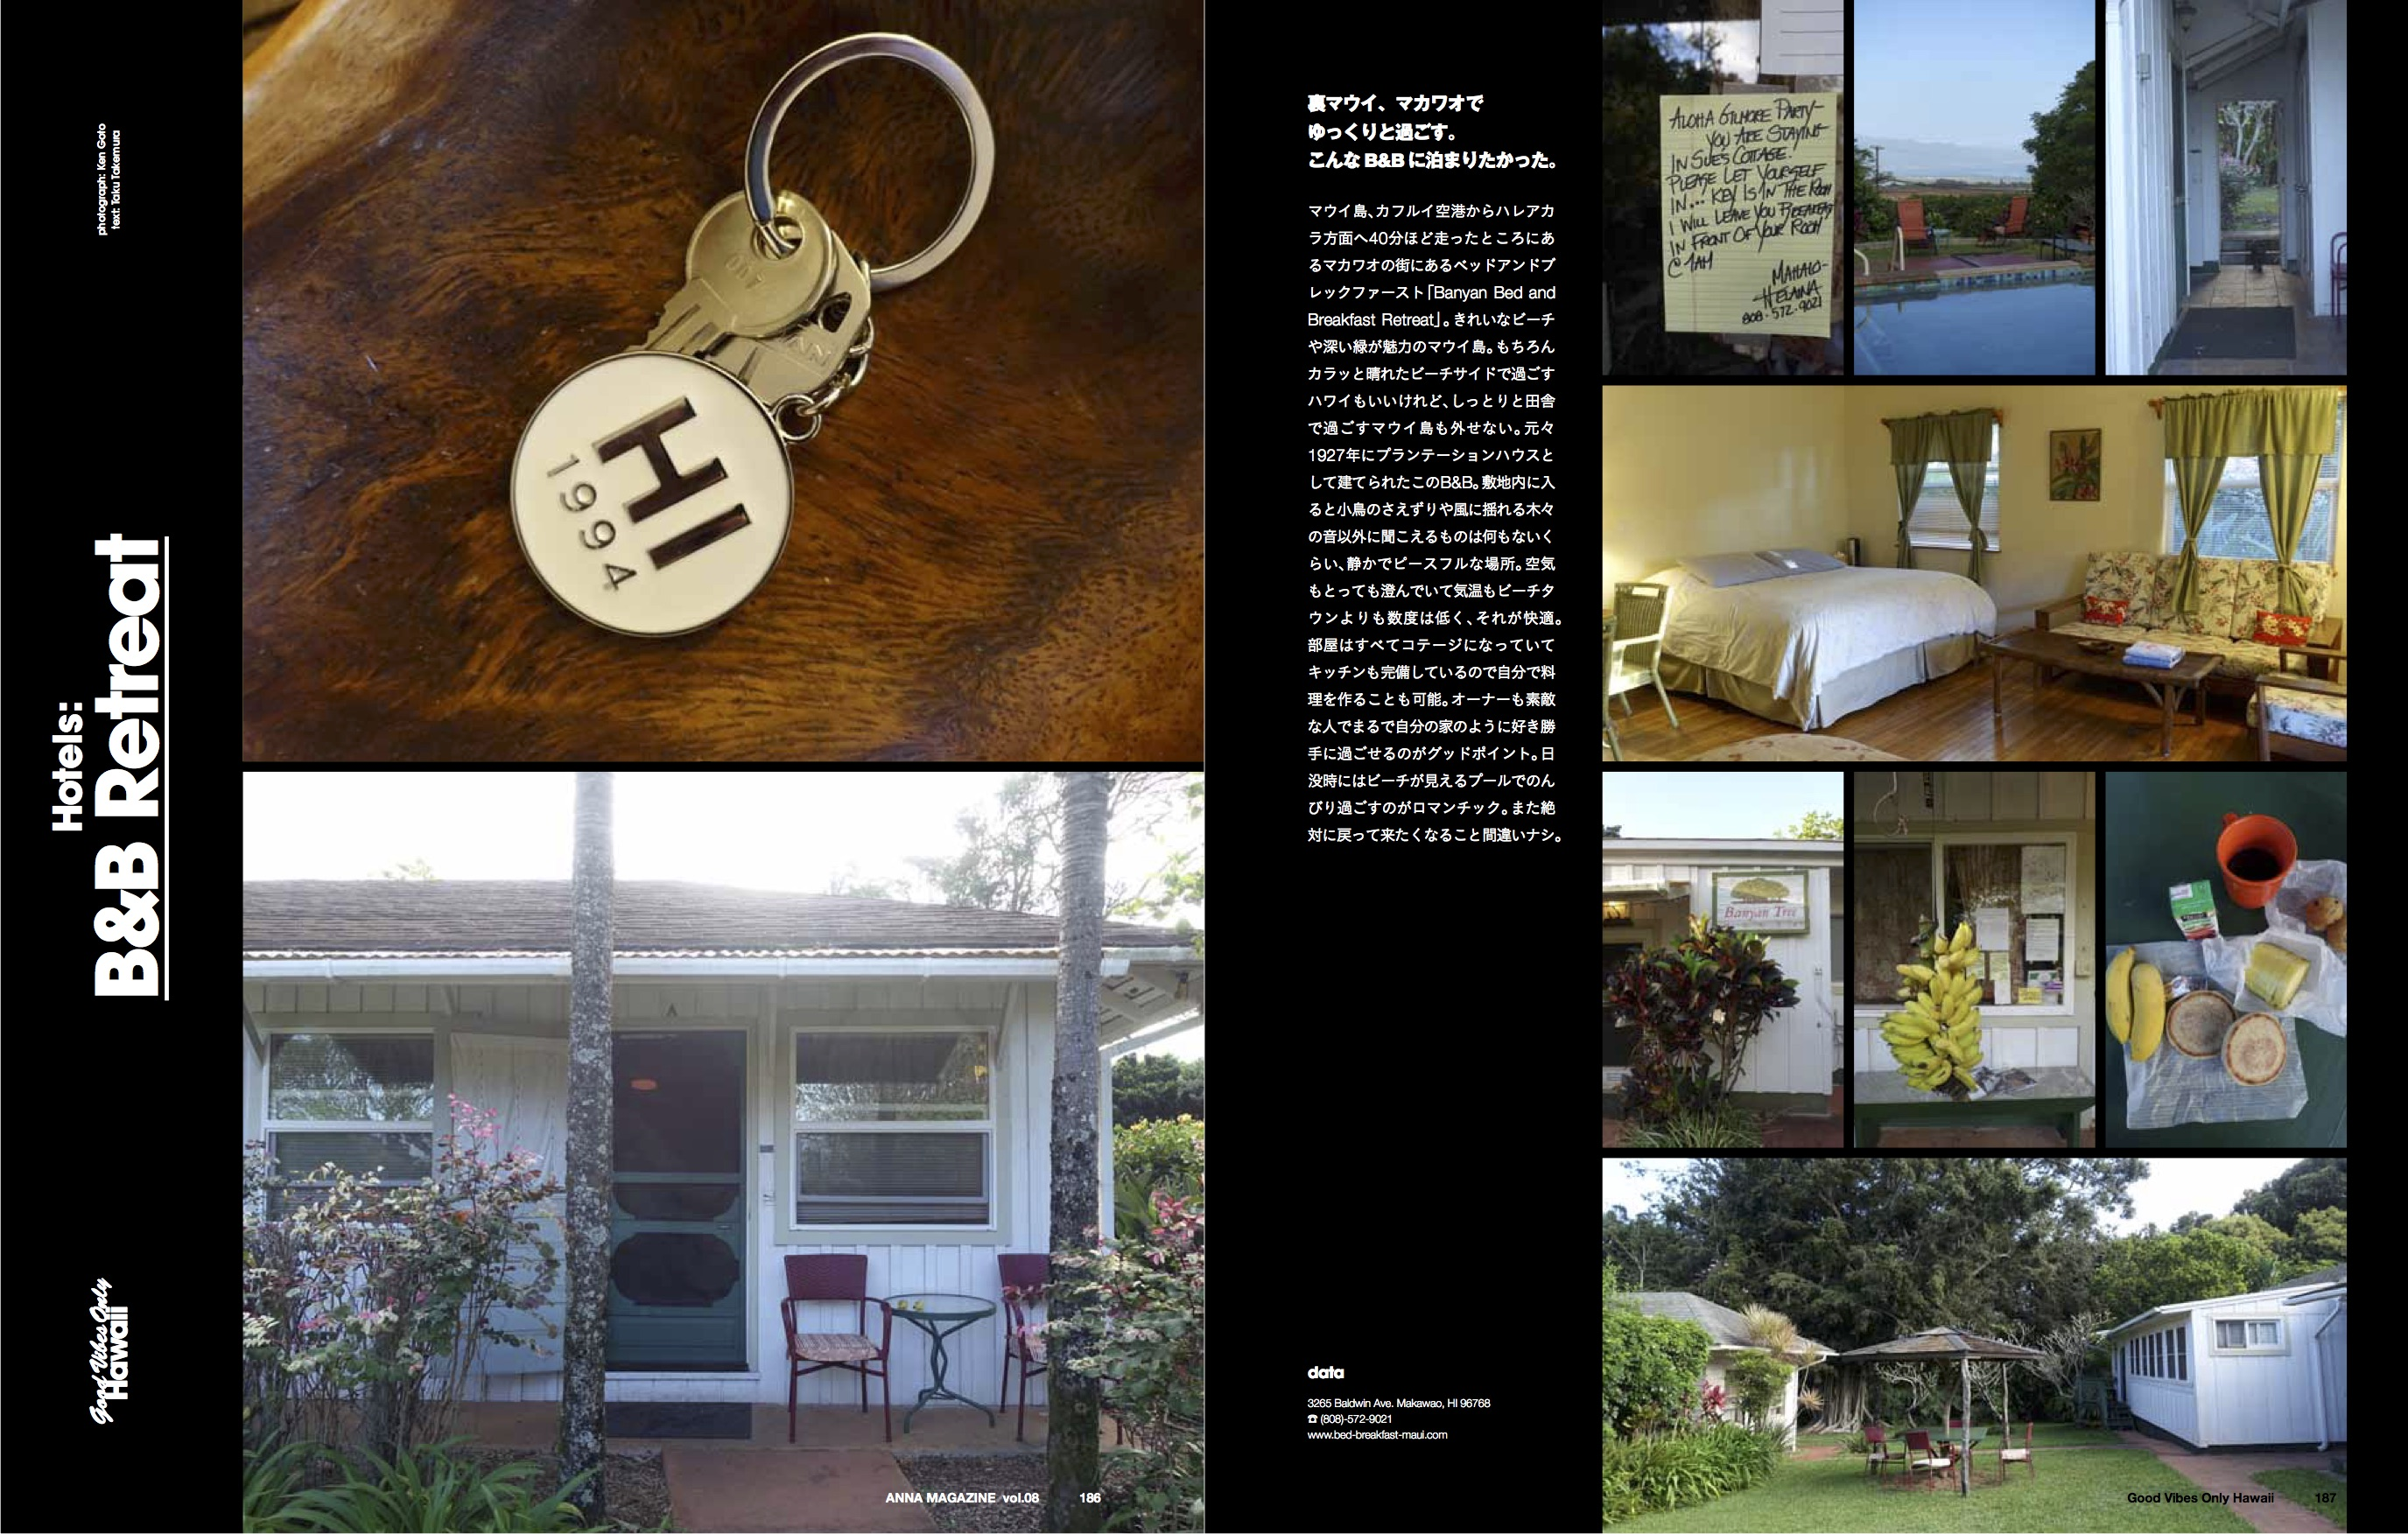 anna magazine vol.8 P94